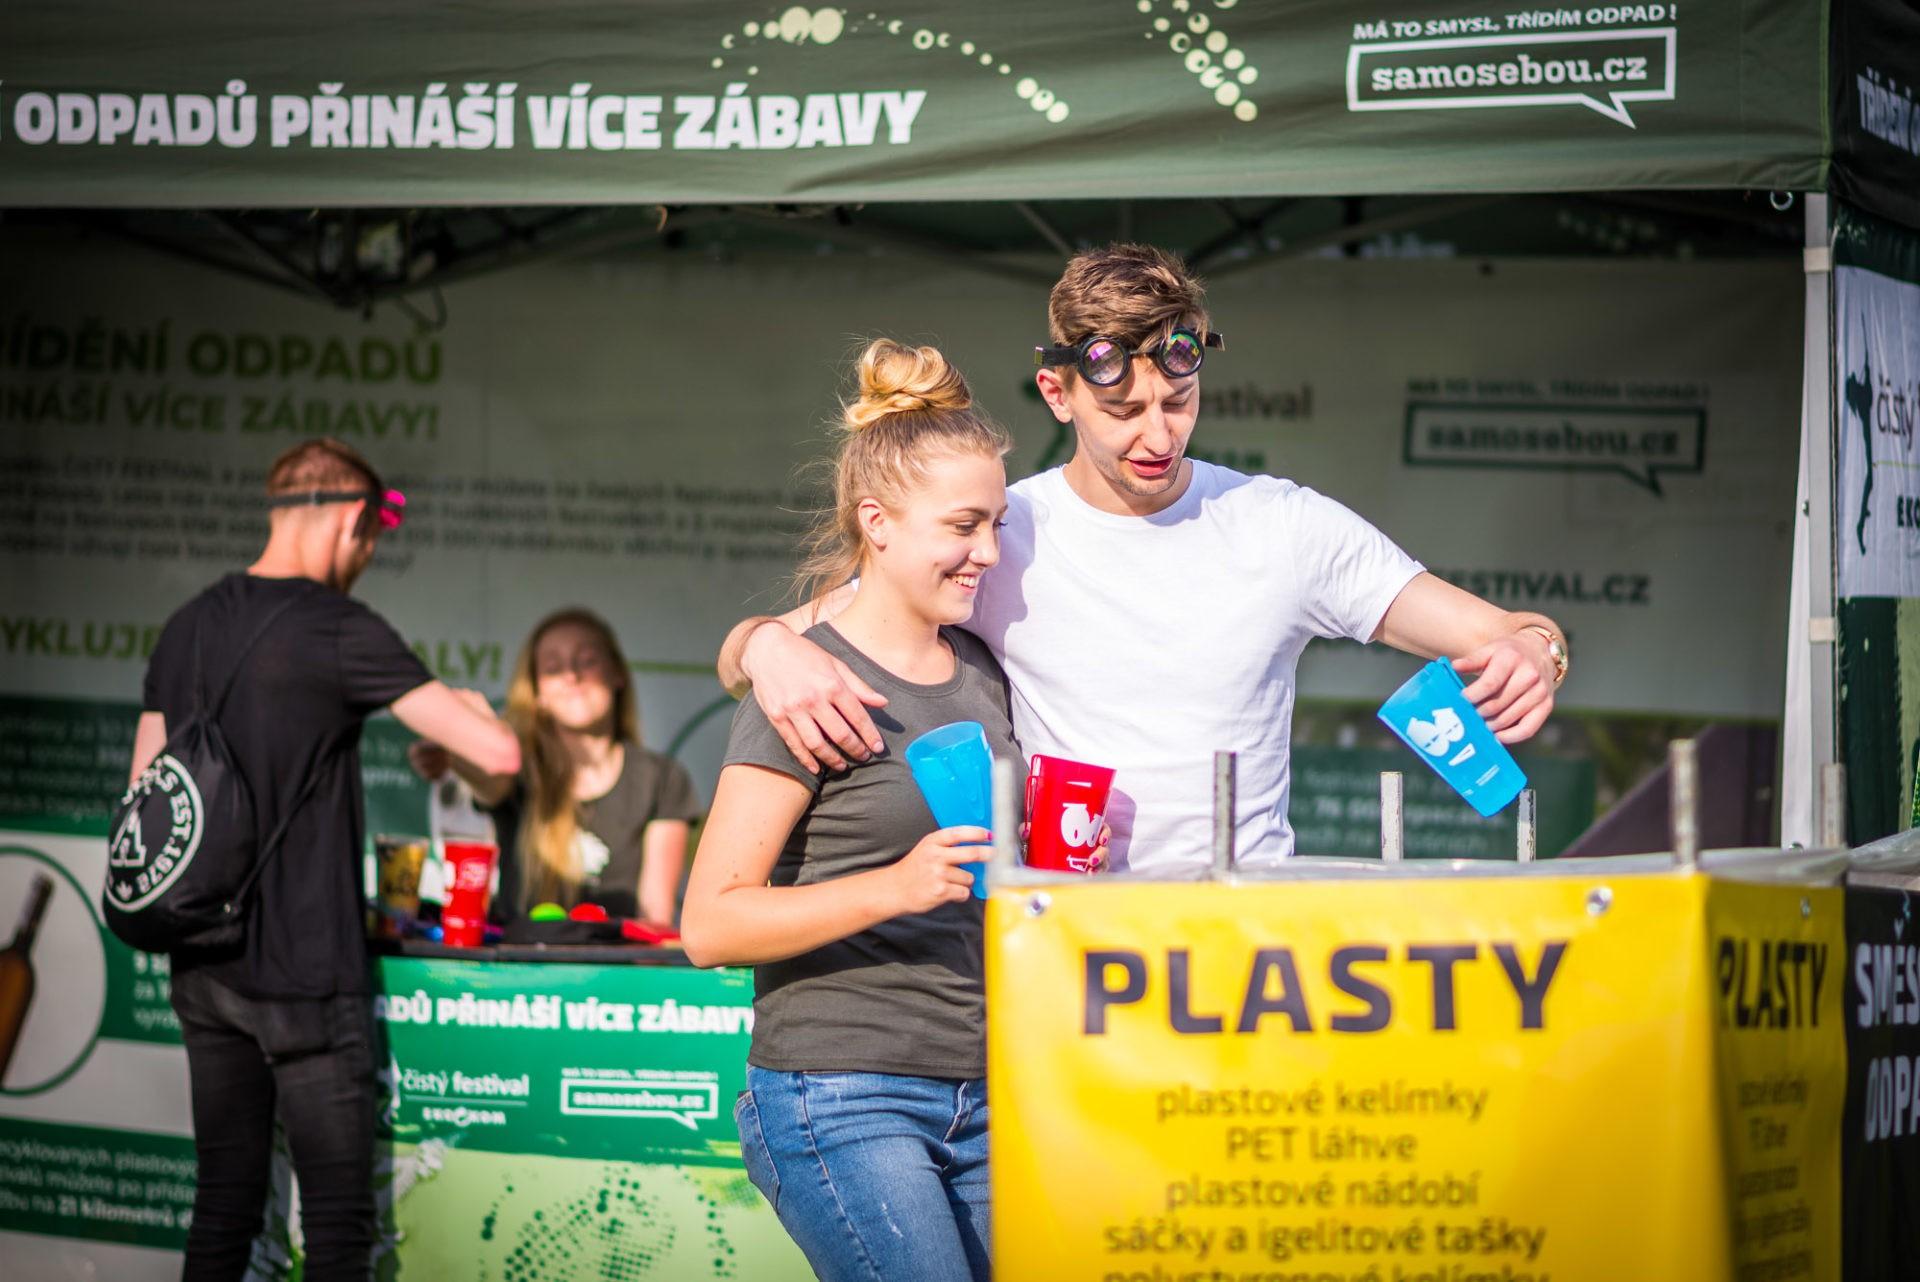 trideni_samosebou_cisty_festival_majales_tridit_odpad_obal_edukace_tridici_kos_plast